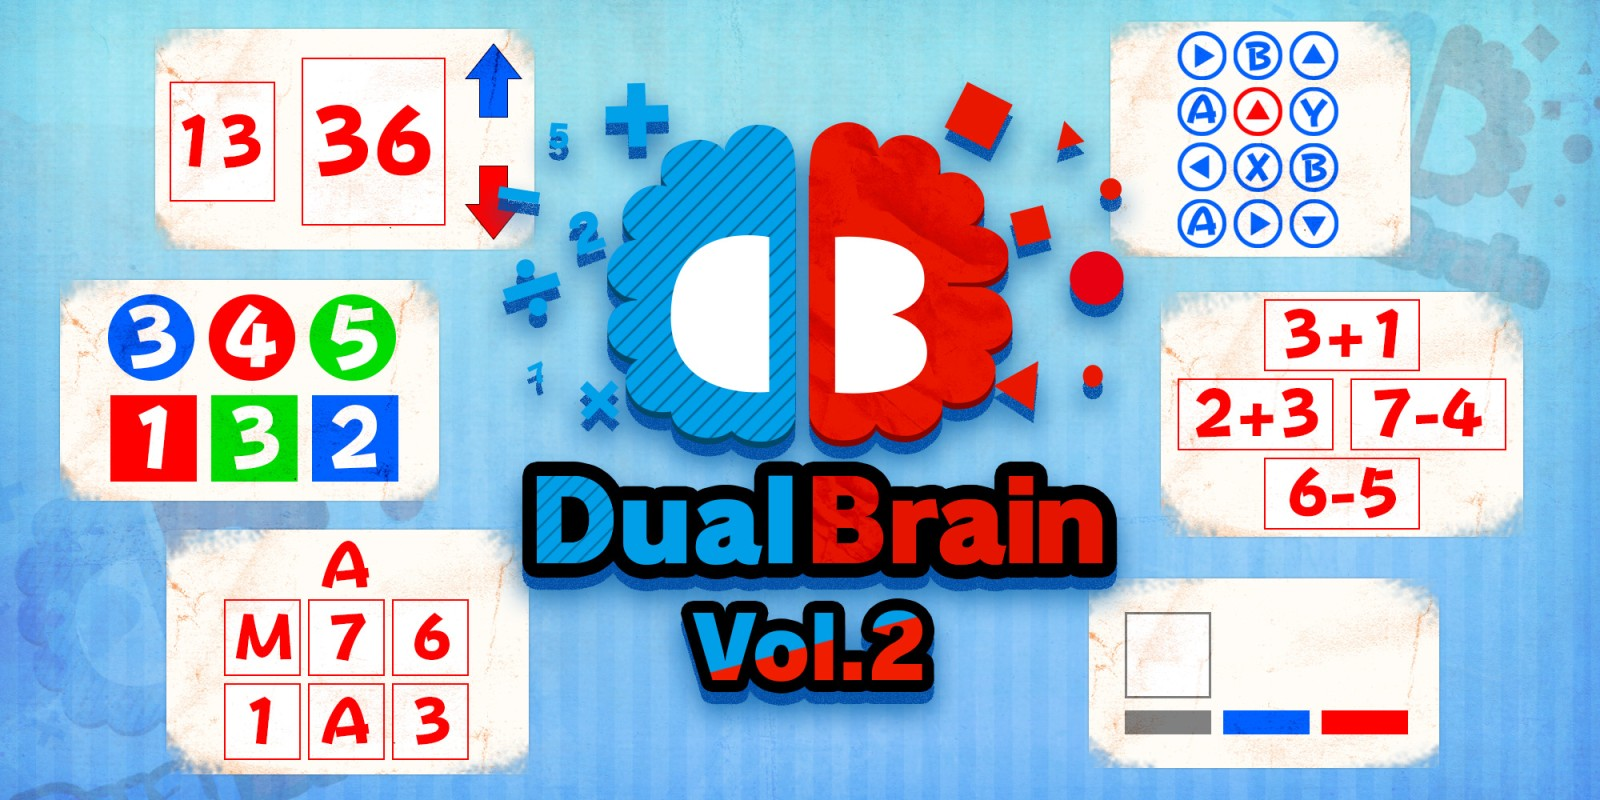 Dual Brain Vol.2: Reflex